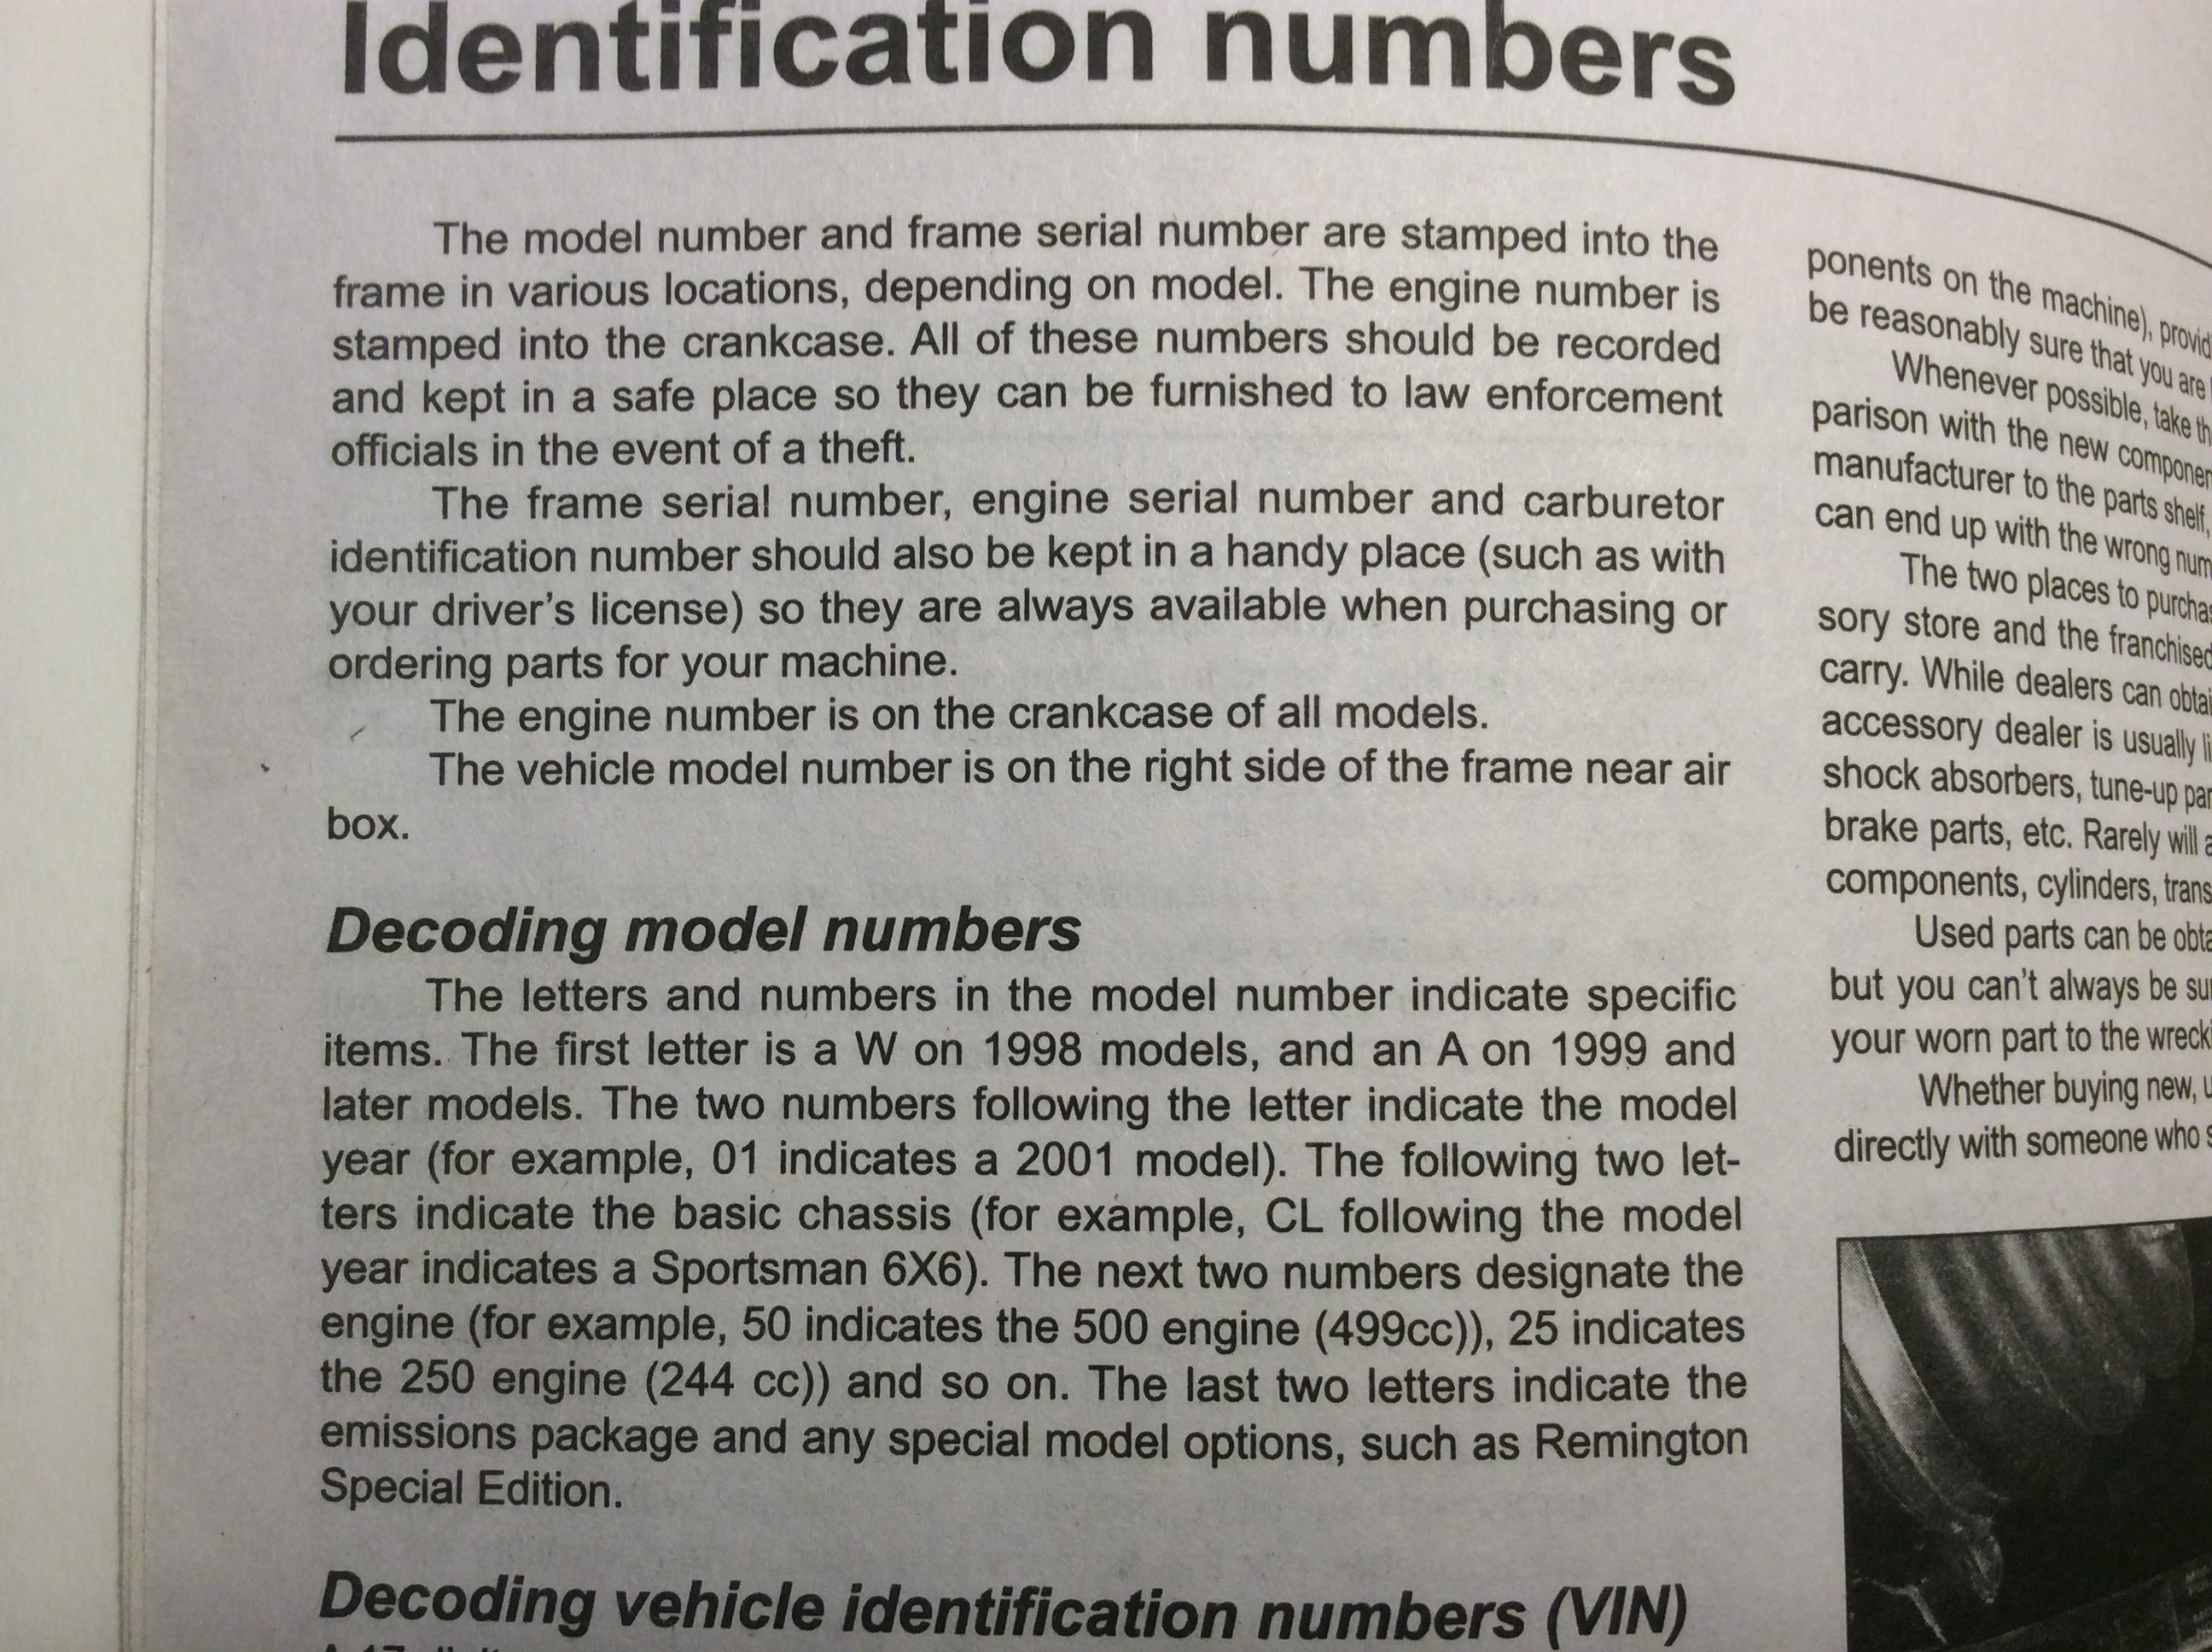 2010 Polaris ranger Vin decoder Vwr